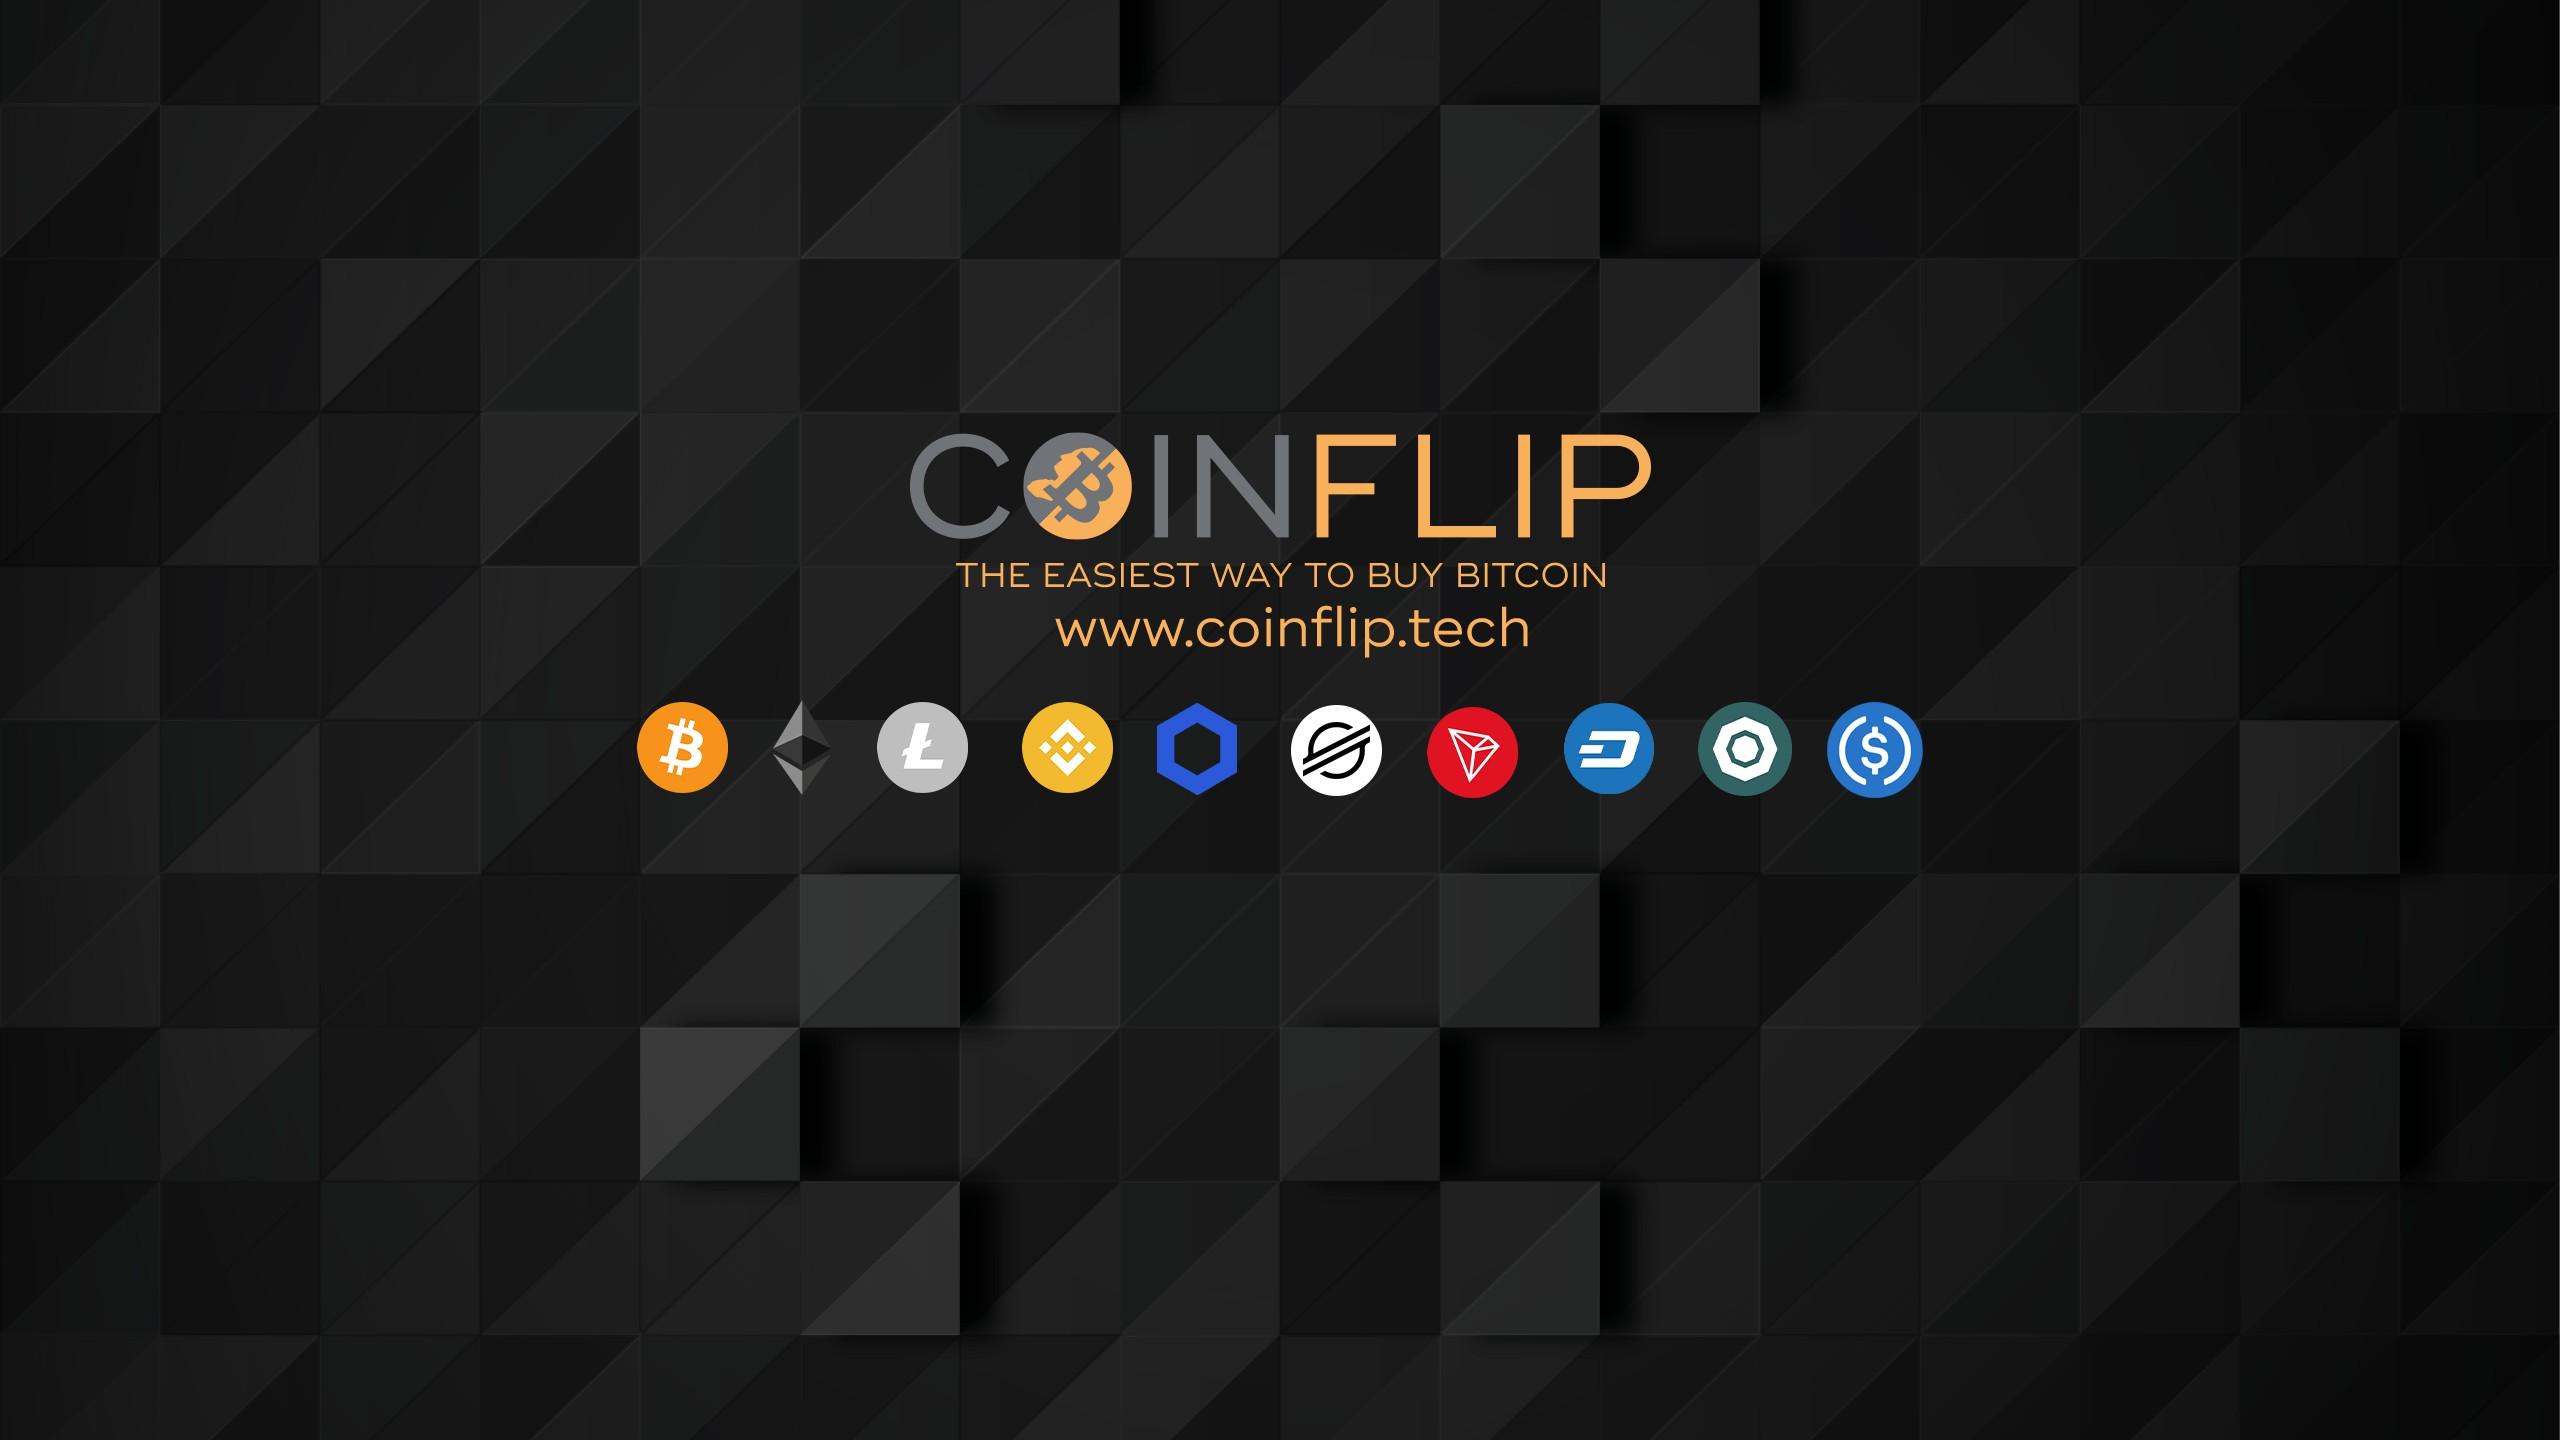 Coinflip Linkedin